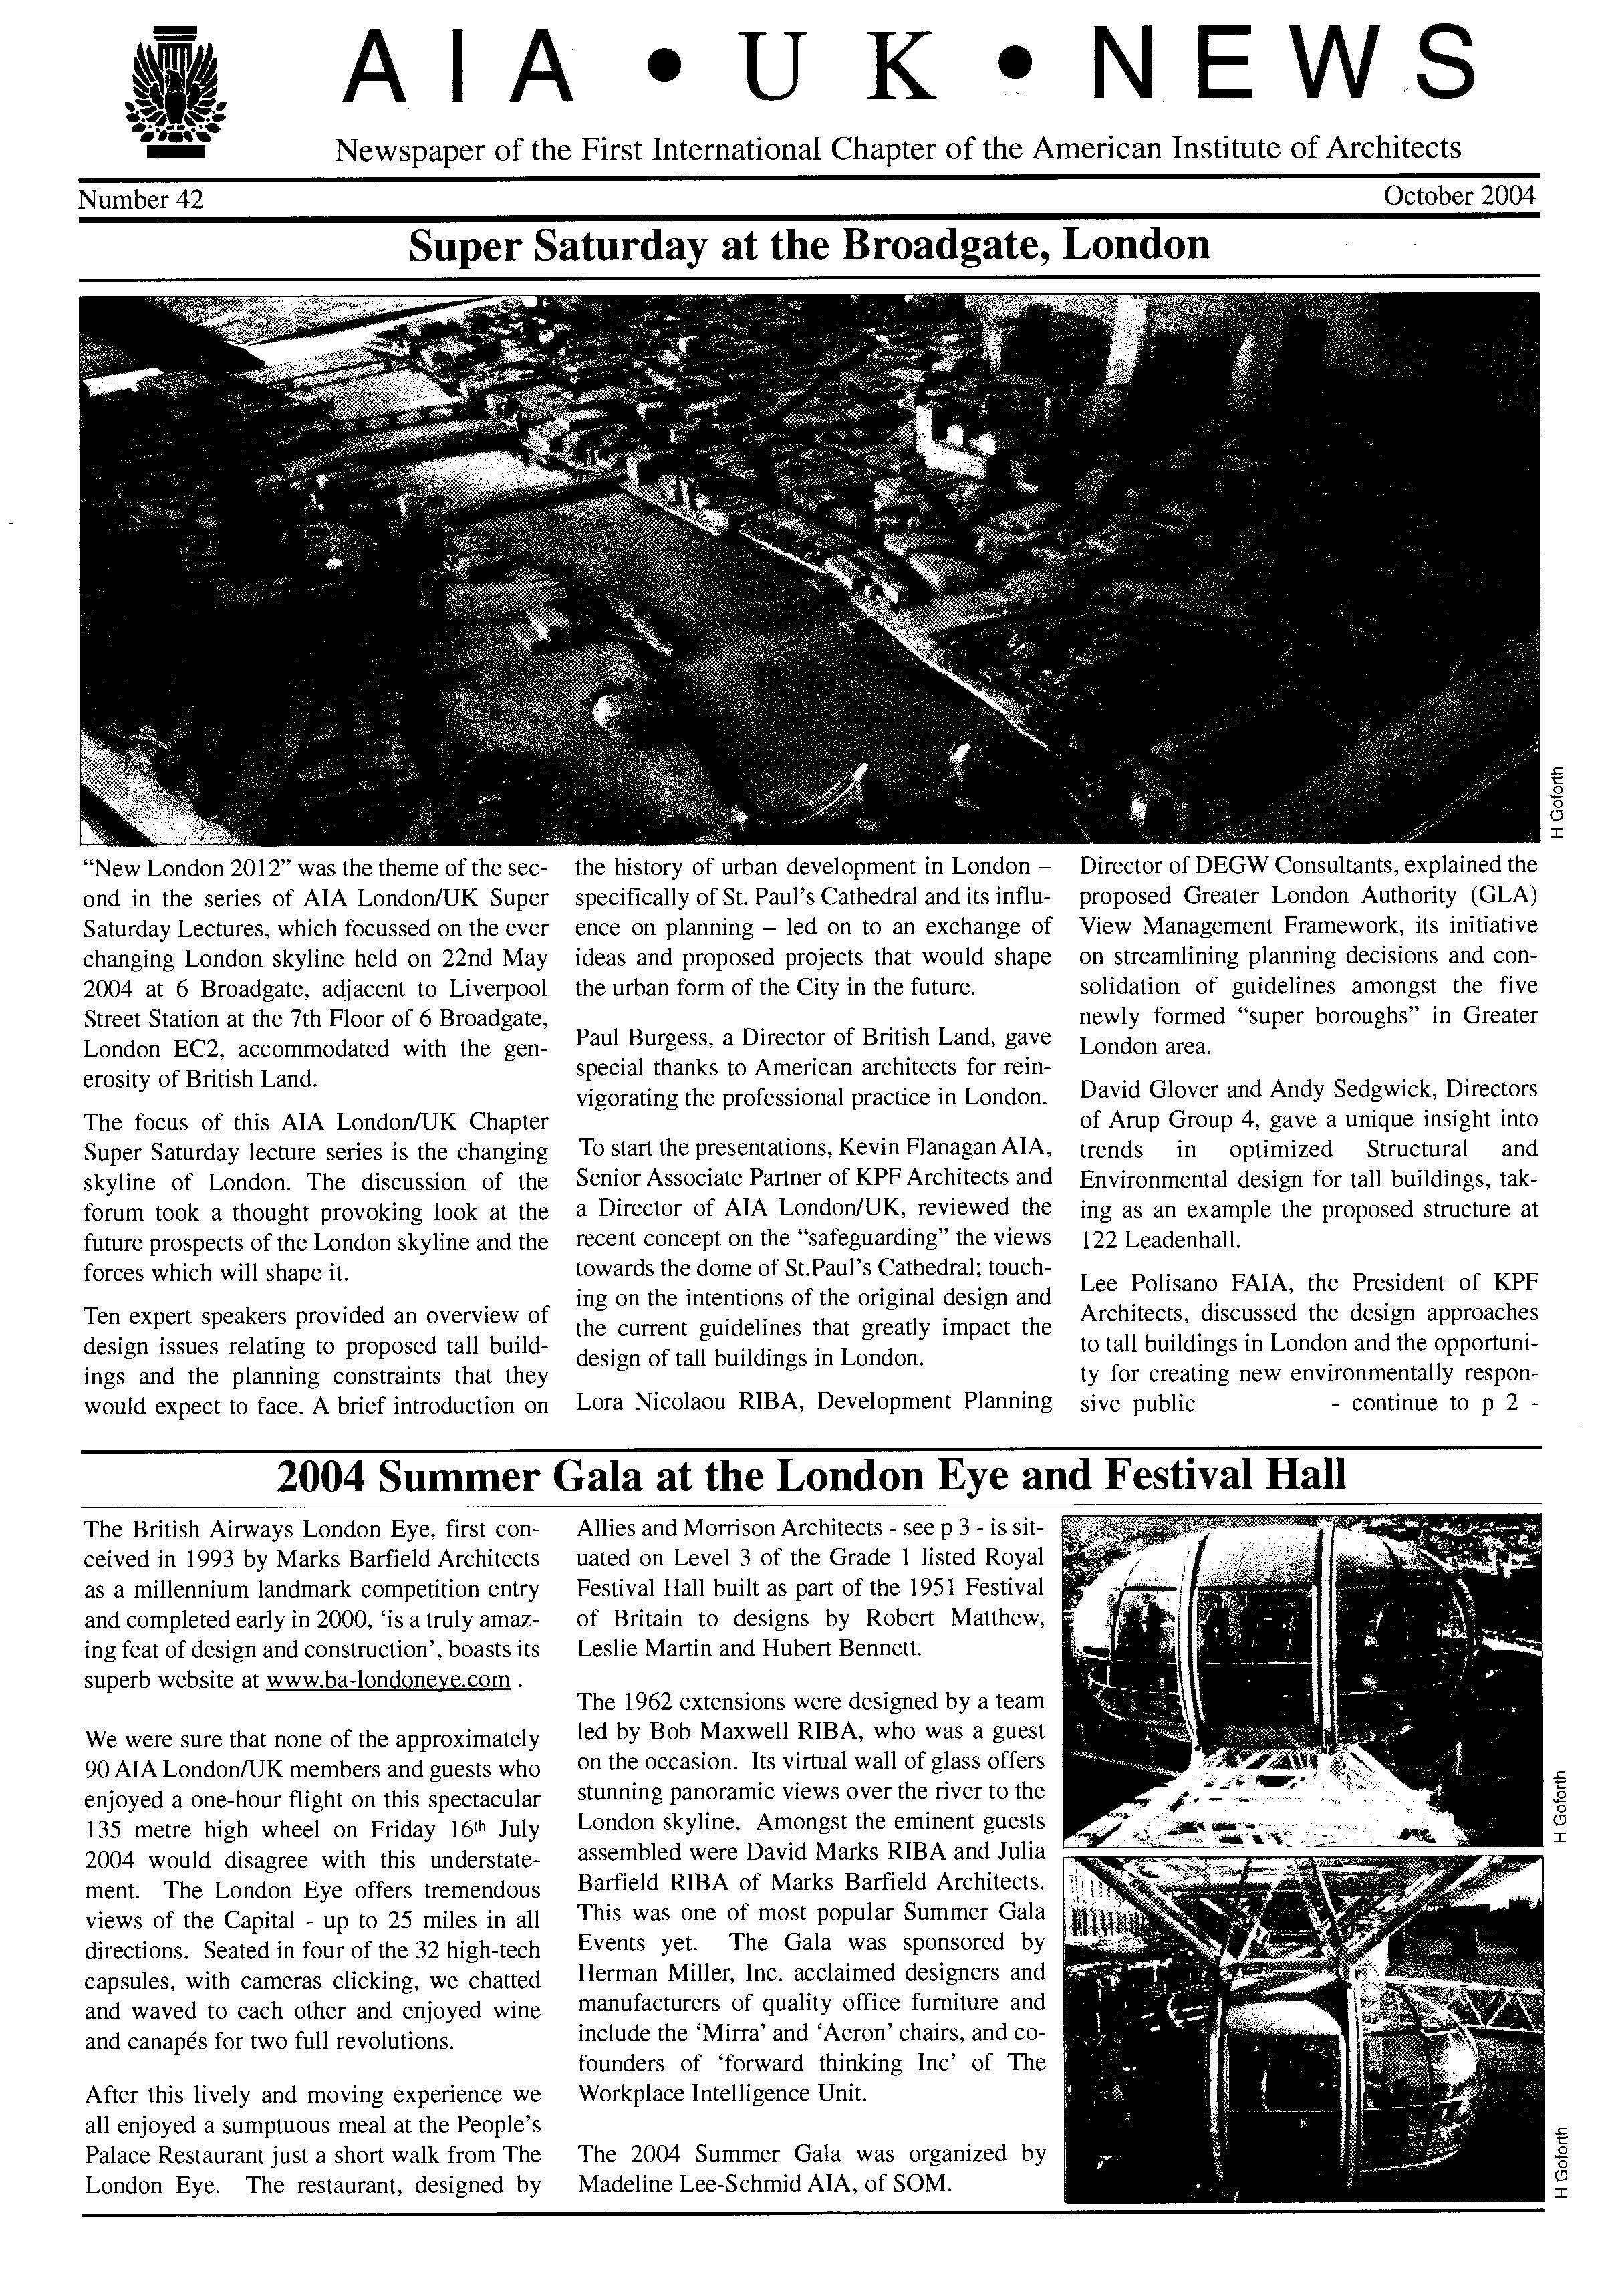 42 - October 2004 web_Page_1.jpg